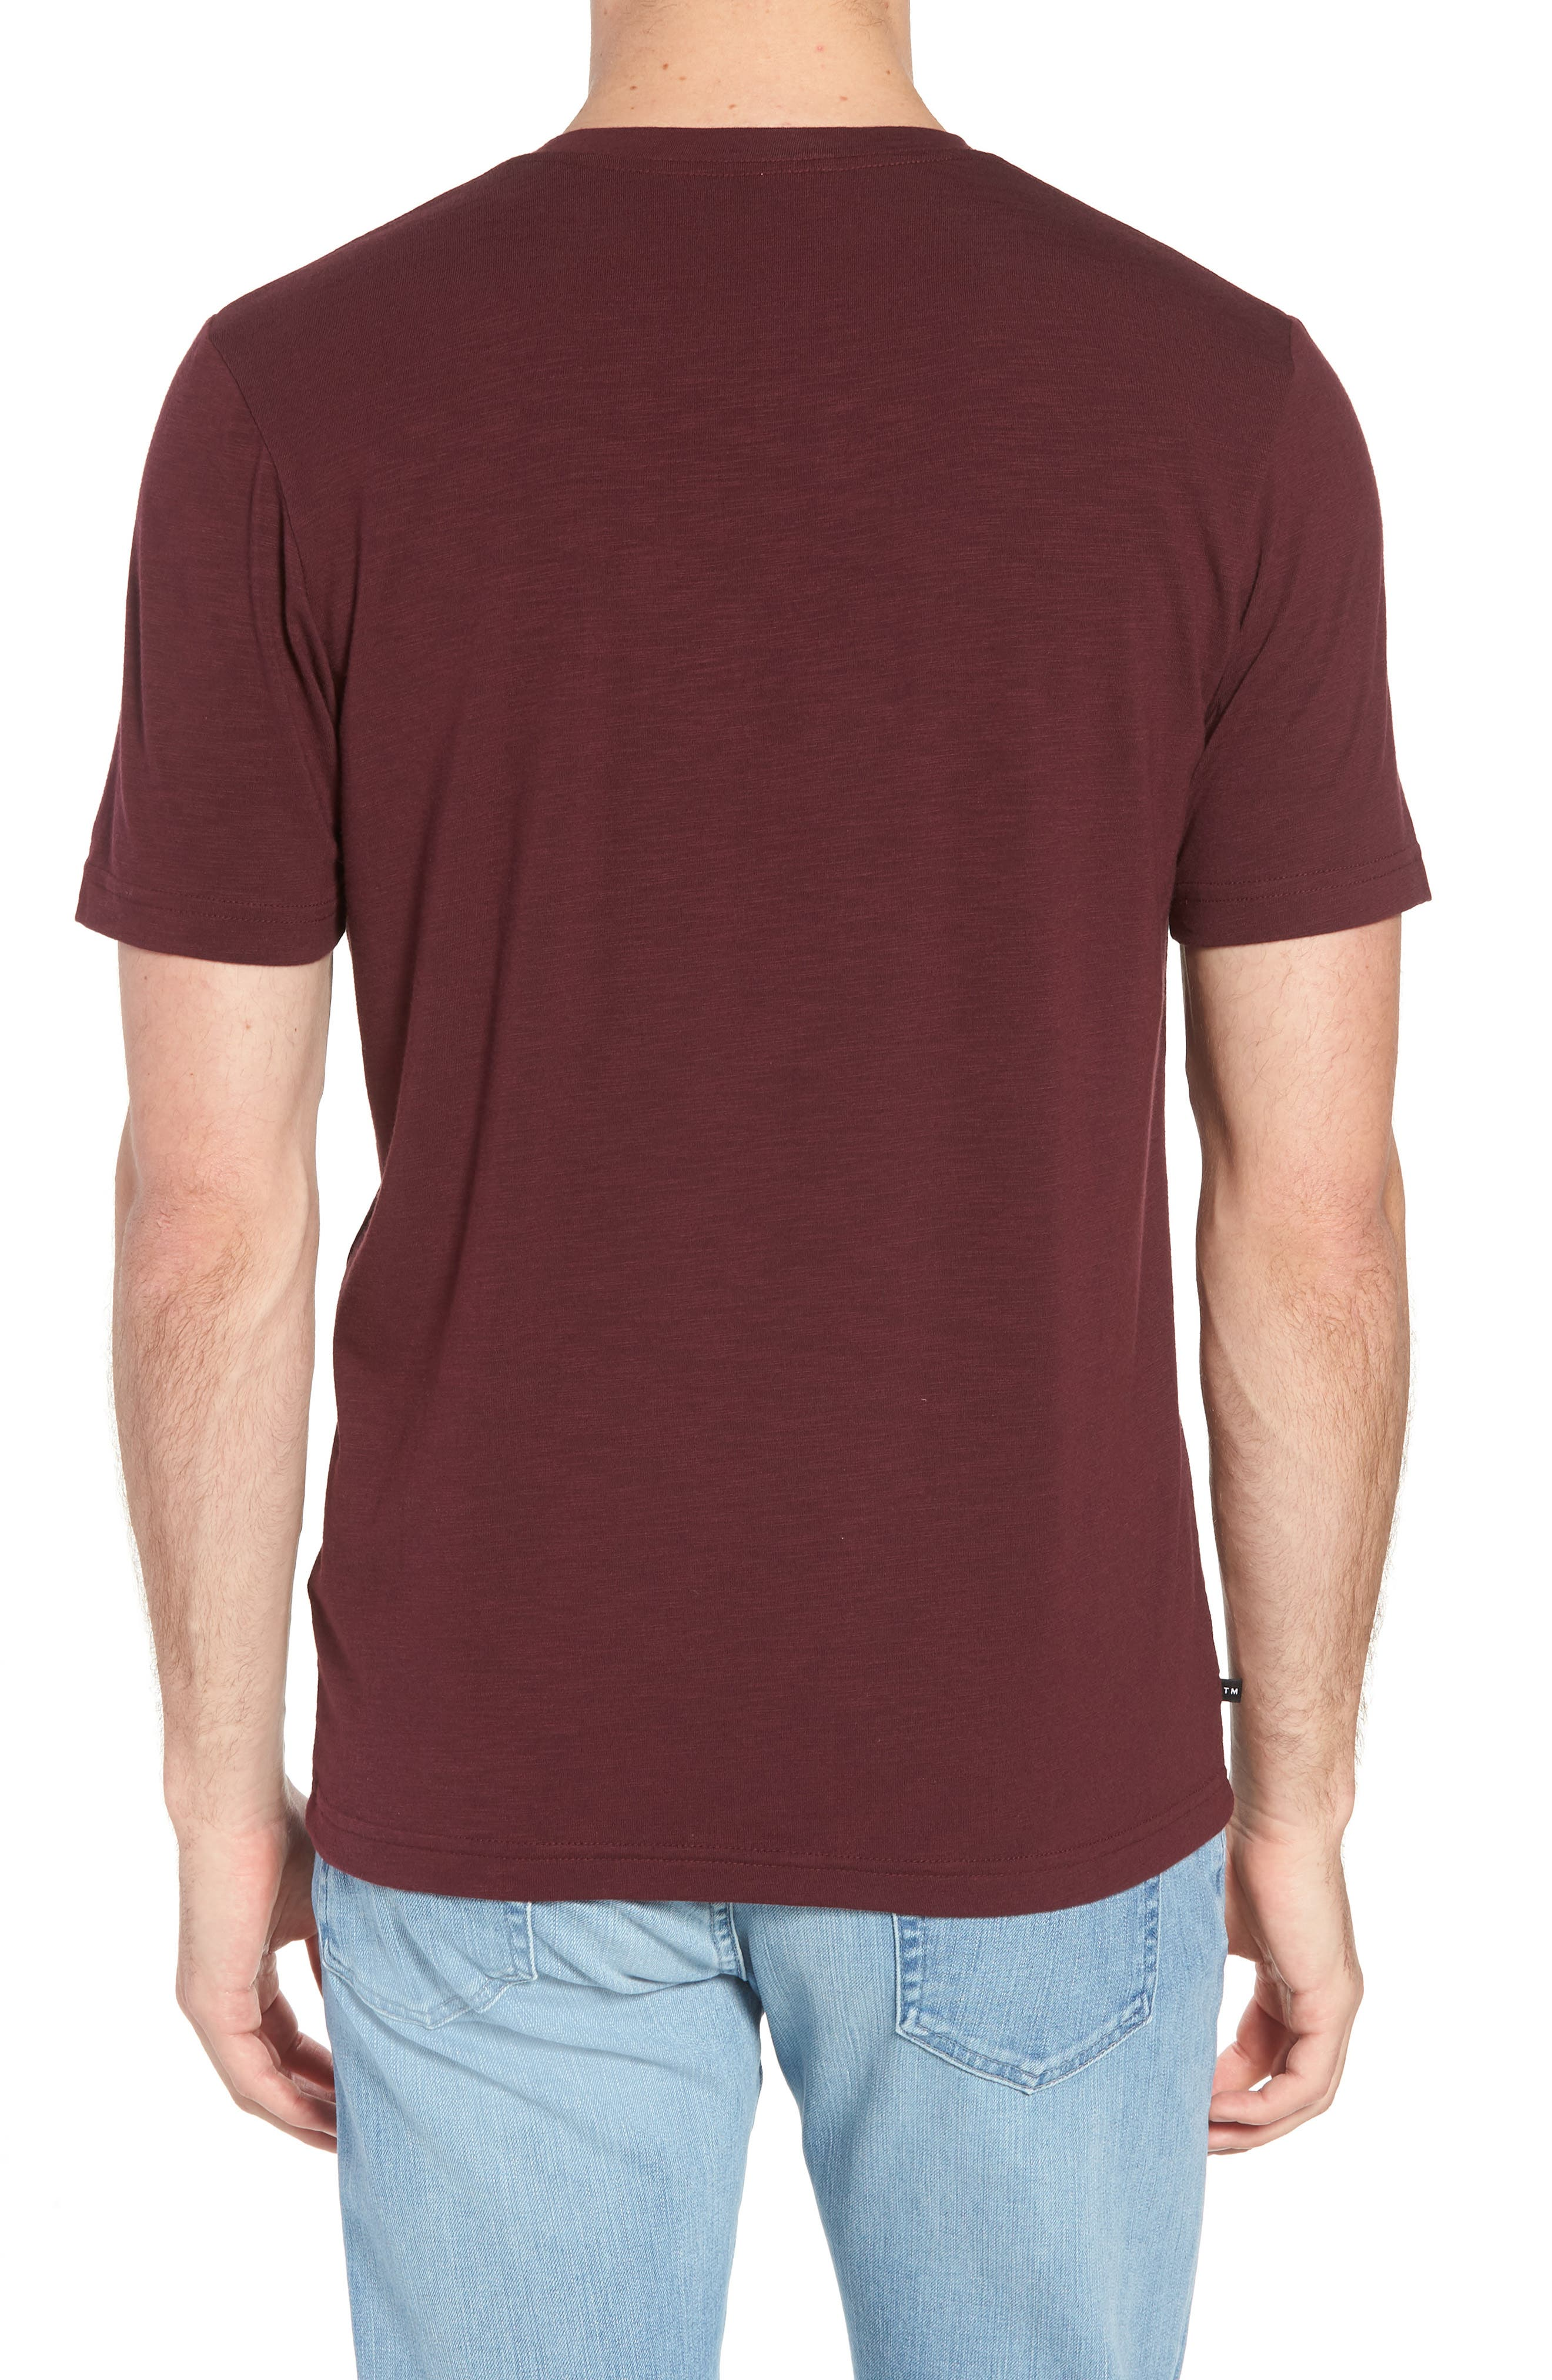 Alternate Image 2  - Travis Mathew 'Trumbull' Trim Fit Slubbed T-Shirt